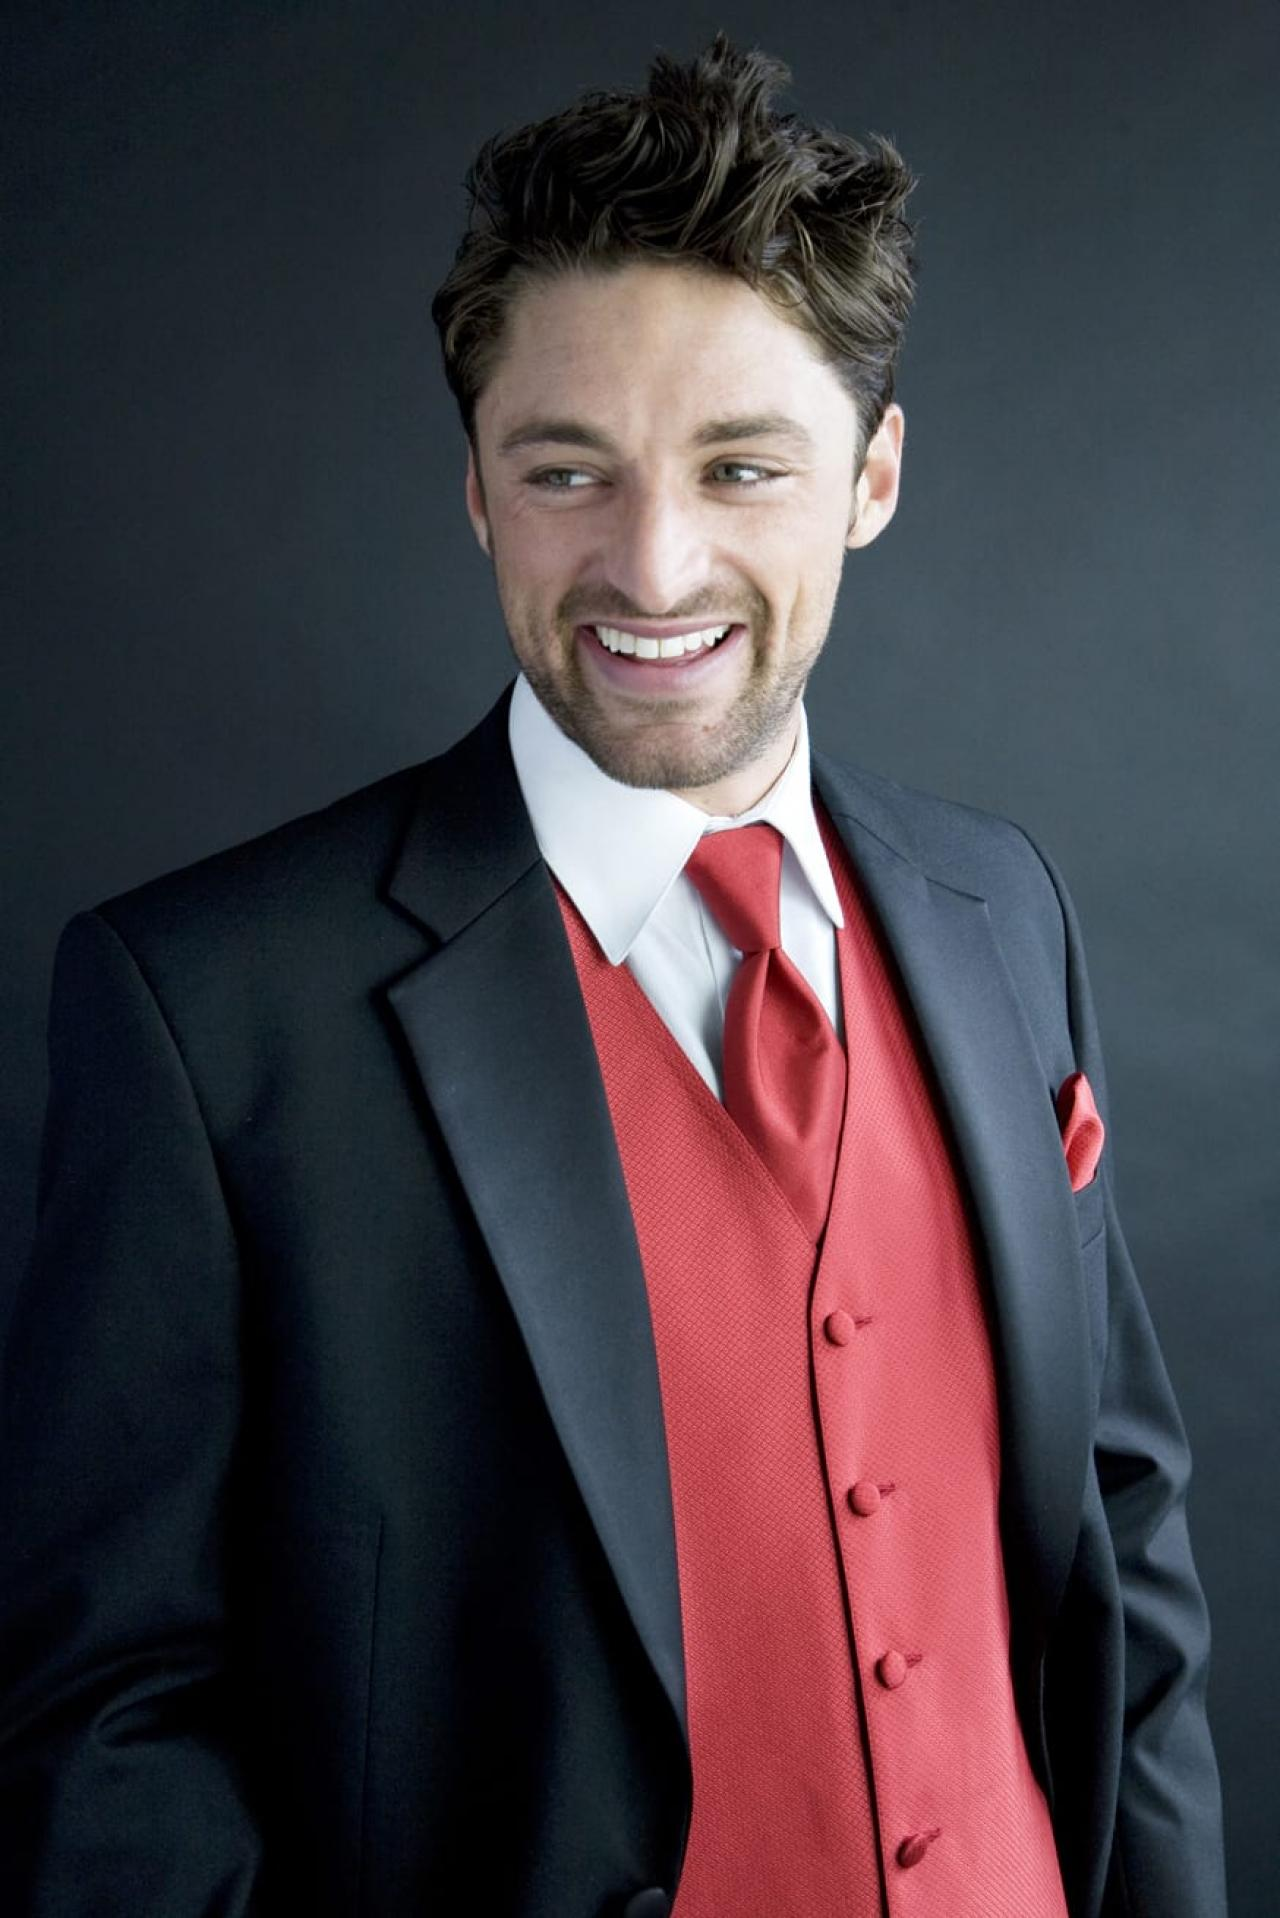 Formal Wear Evergreen Park | Designer Tuxedos | Boss Formal Wear